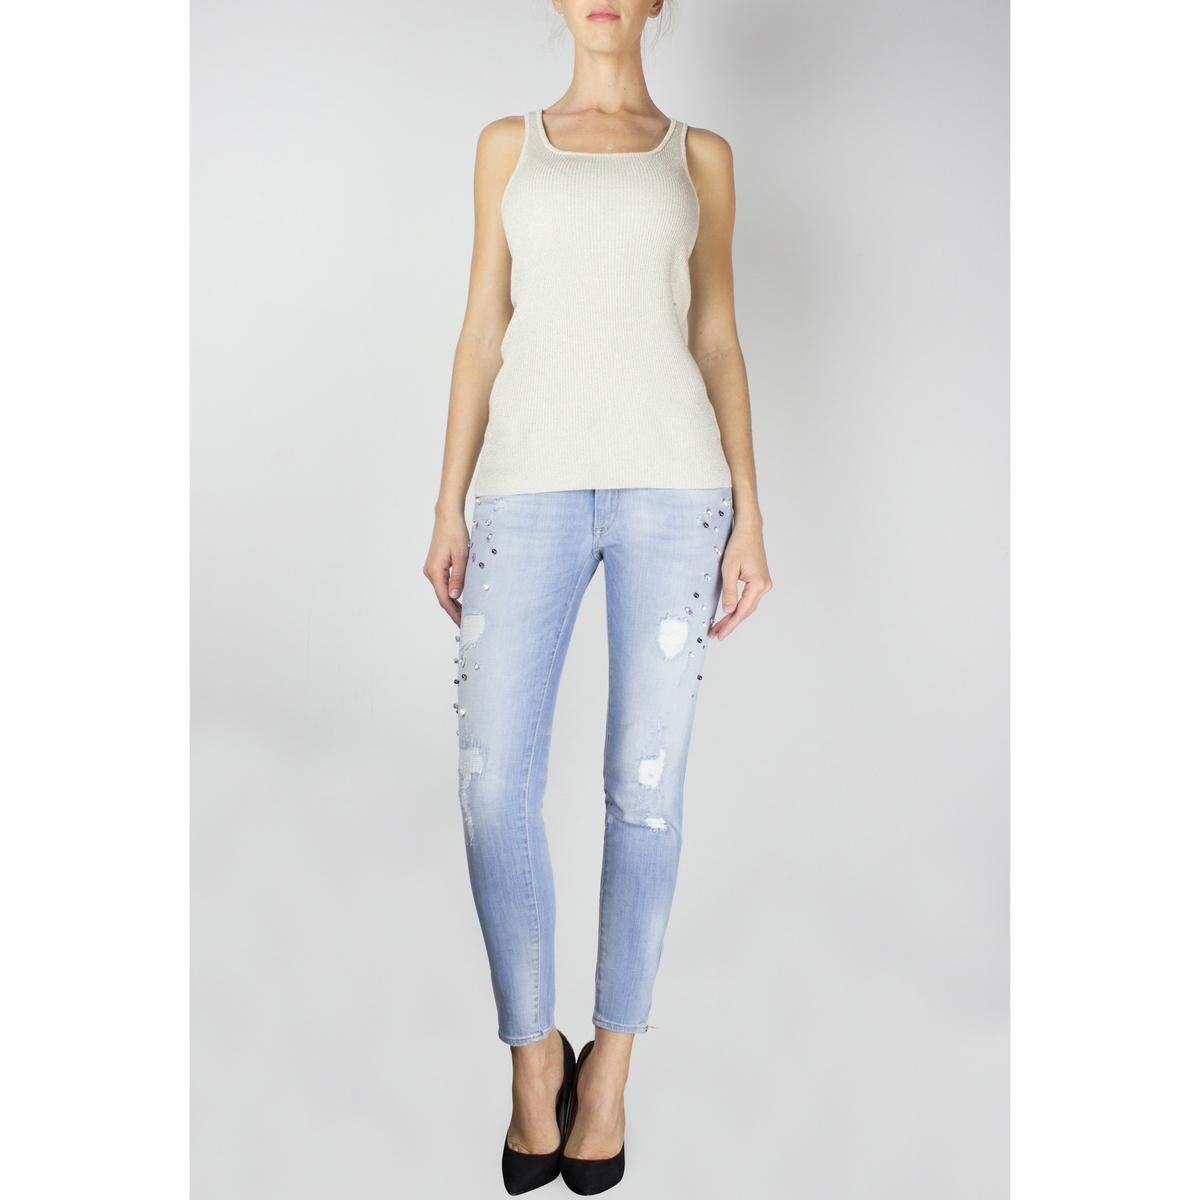 Jeans skinny destroy, fecho na base das perneiras